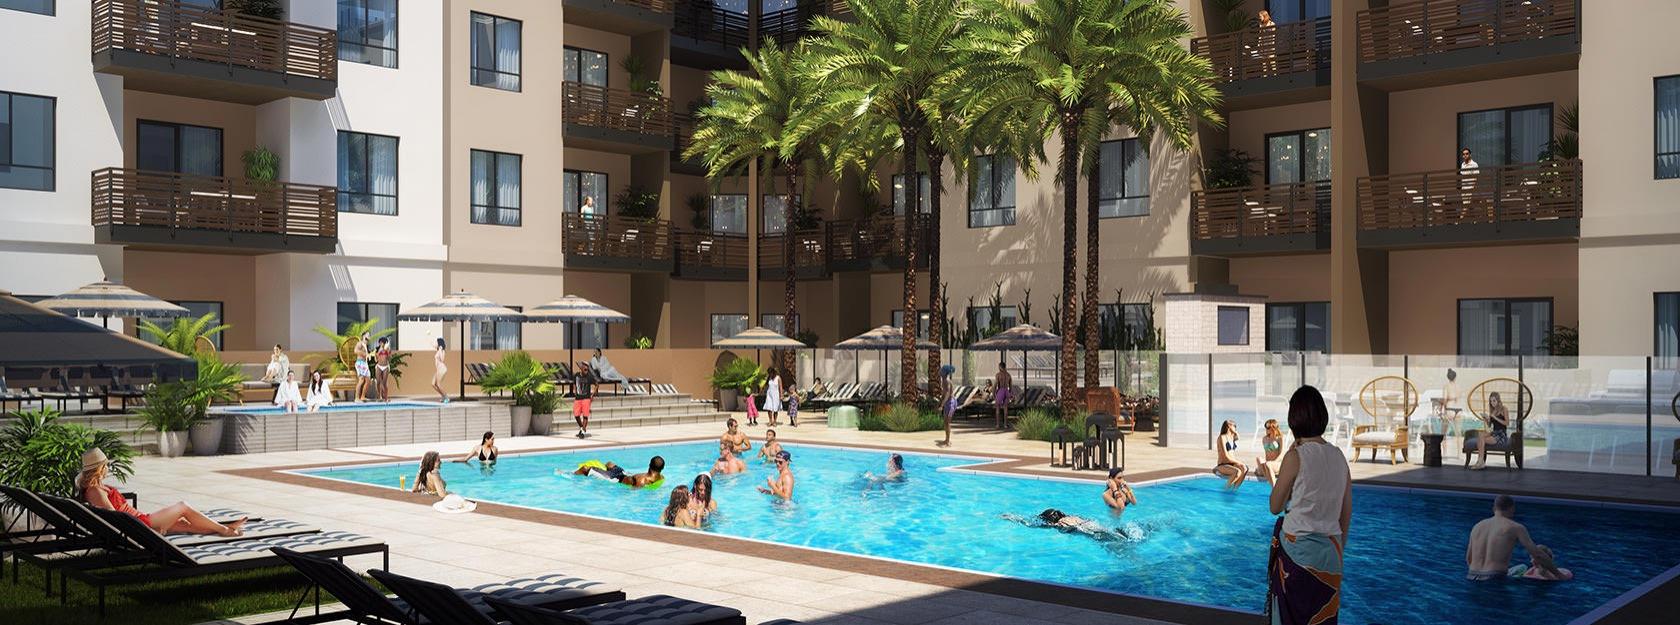 rendering of swimming pool